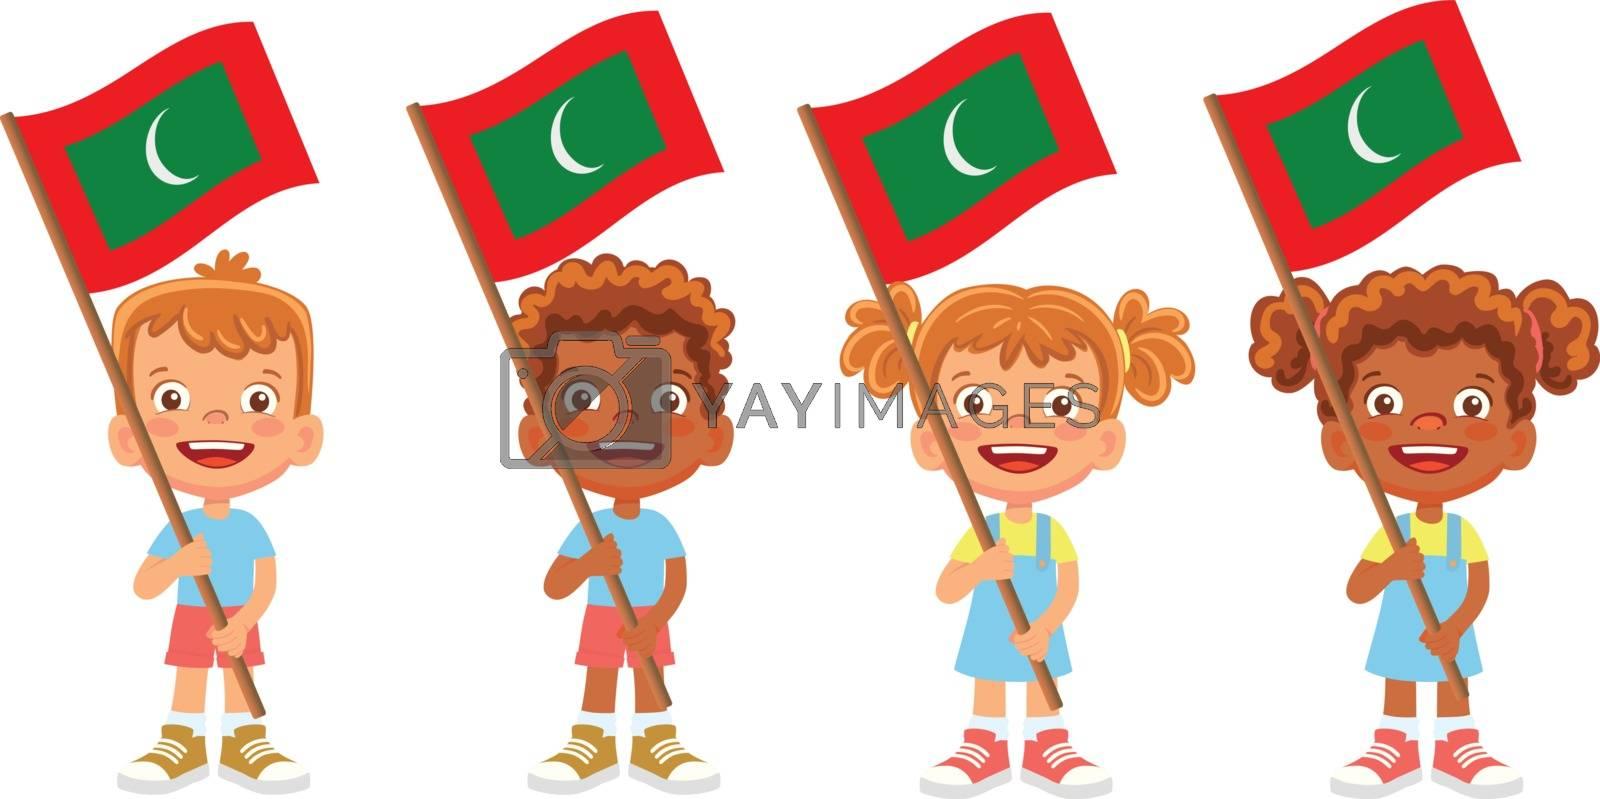 Maldives flag in hand. Children holding flag. National flag of Maldives vector